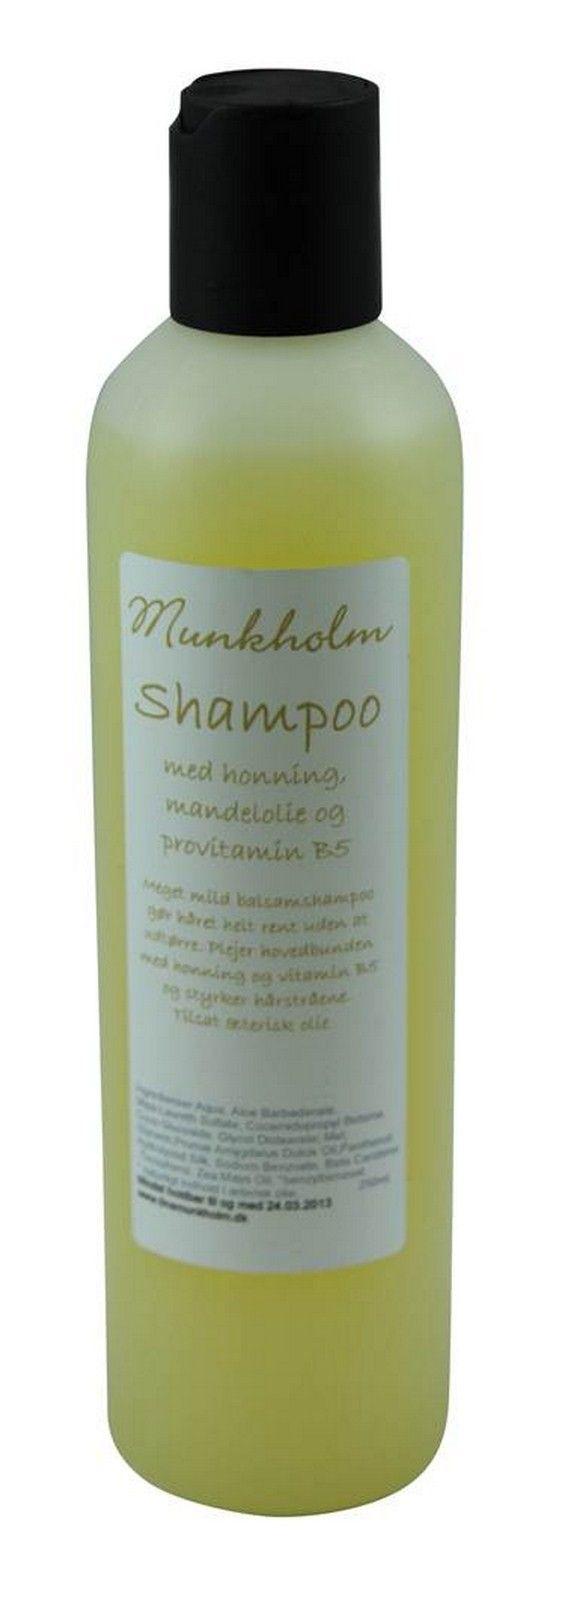 Munkholm shampoo - Tankestrejf.dk